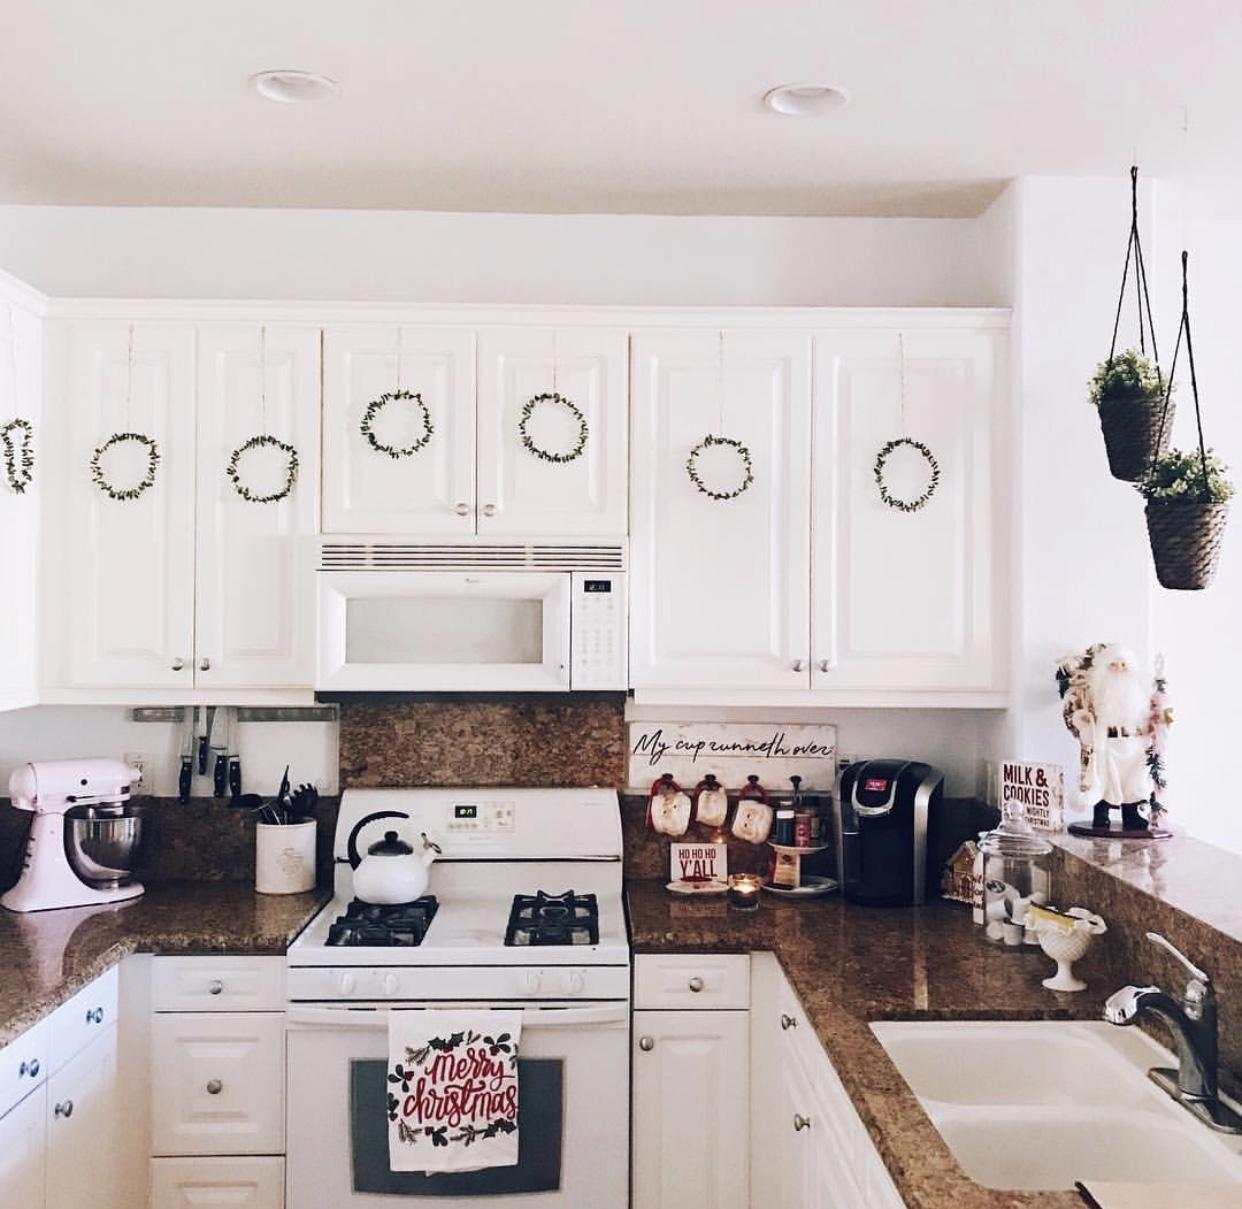 Our kitchen, Christmas 2017